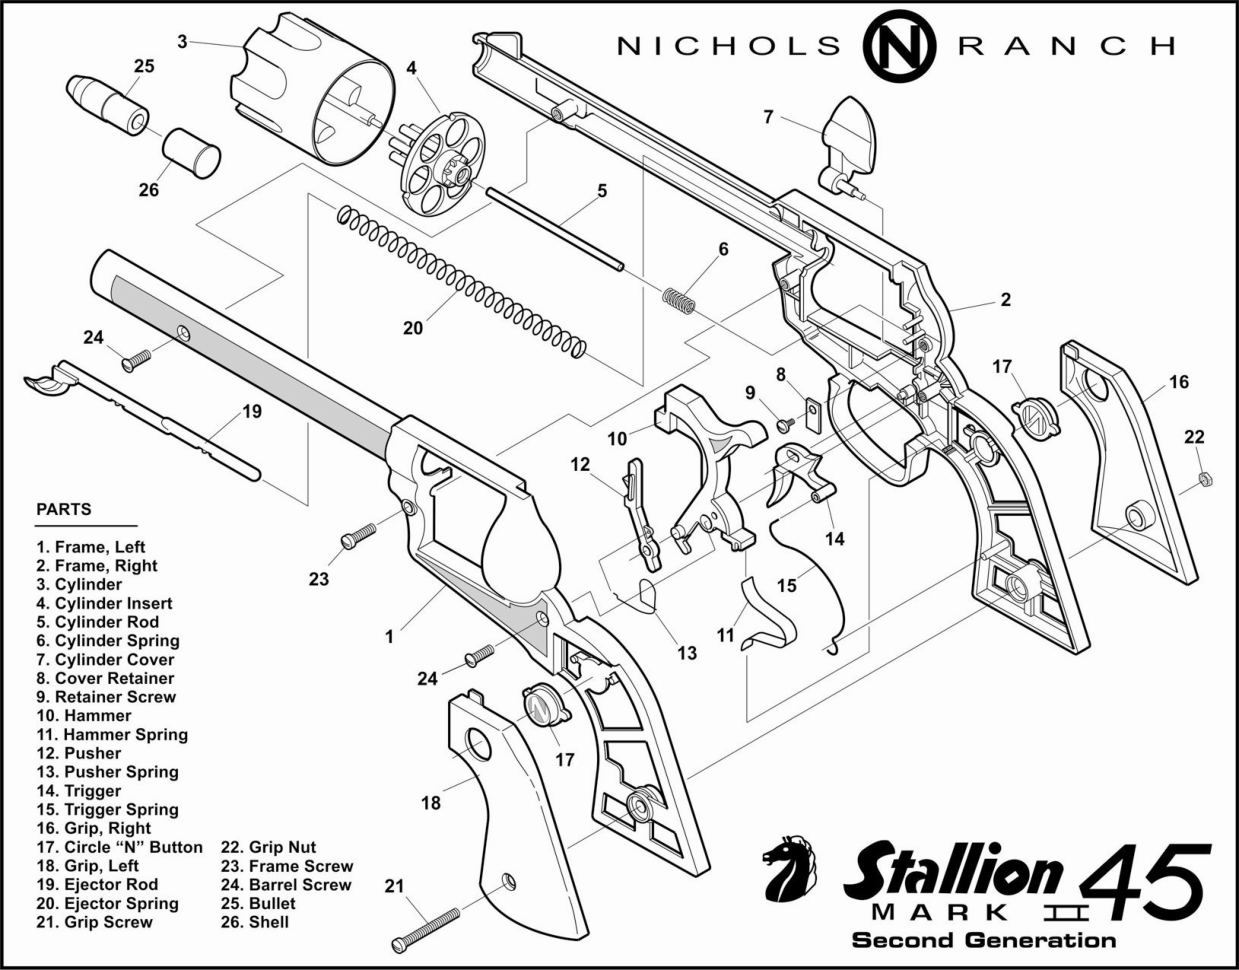 1239x970 Nichols Stallion 45 Mk Ii Cap Guns And Varieties Of Stallion Cap